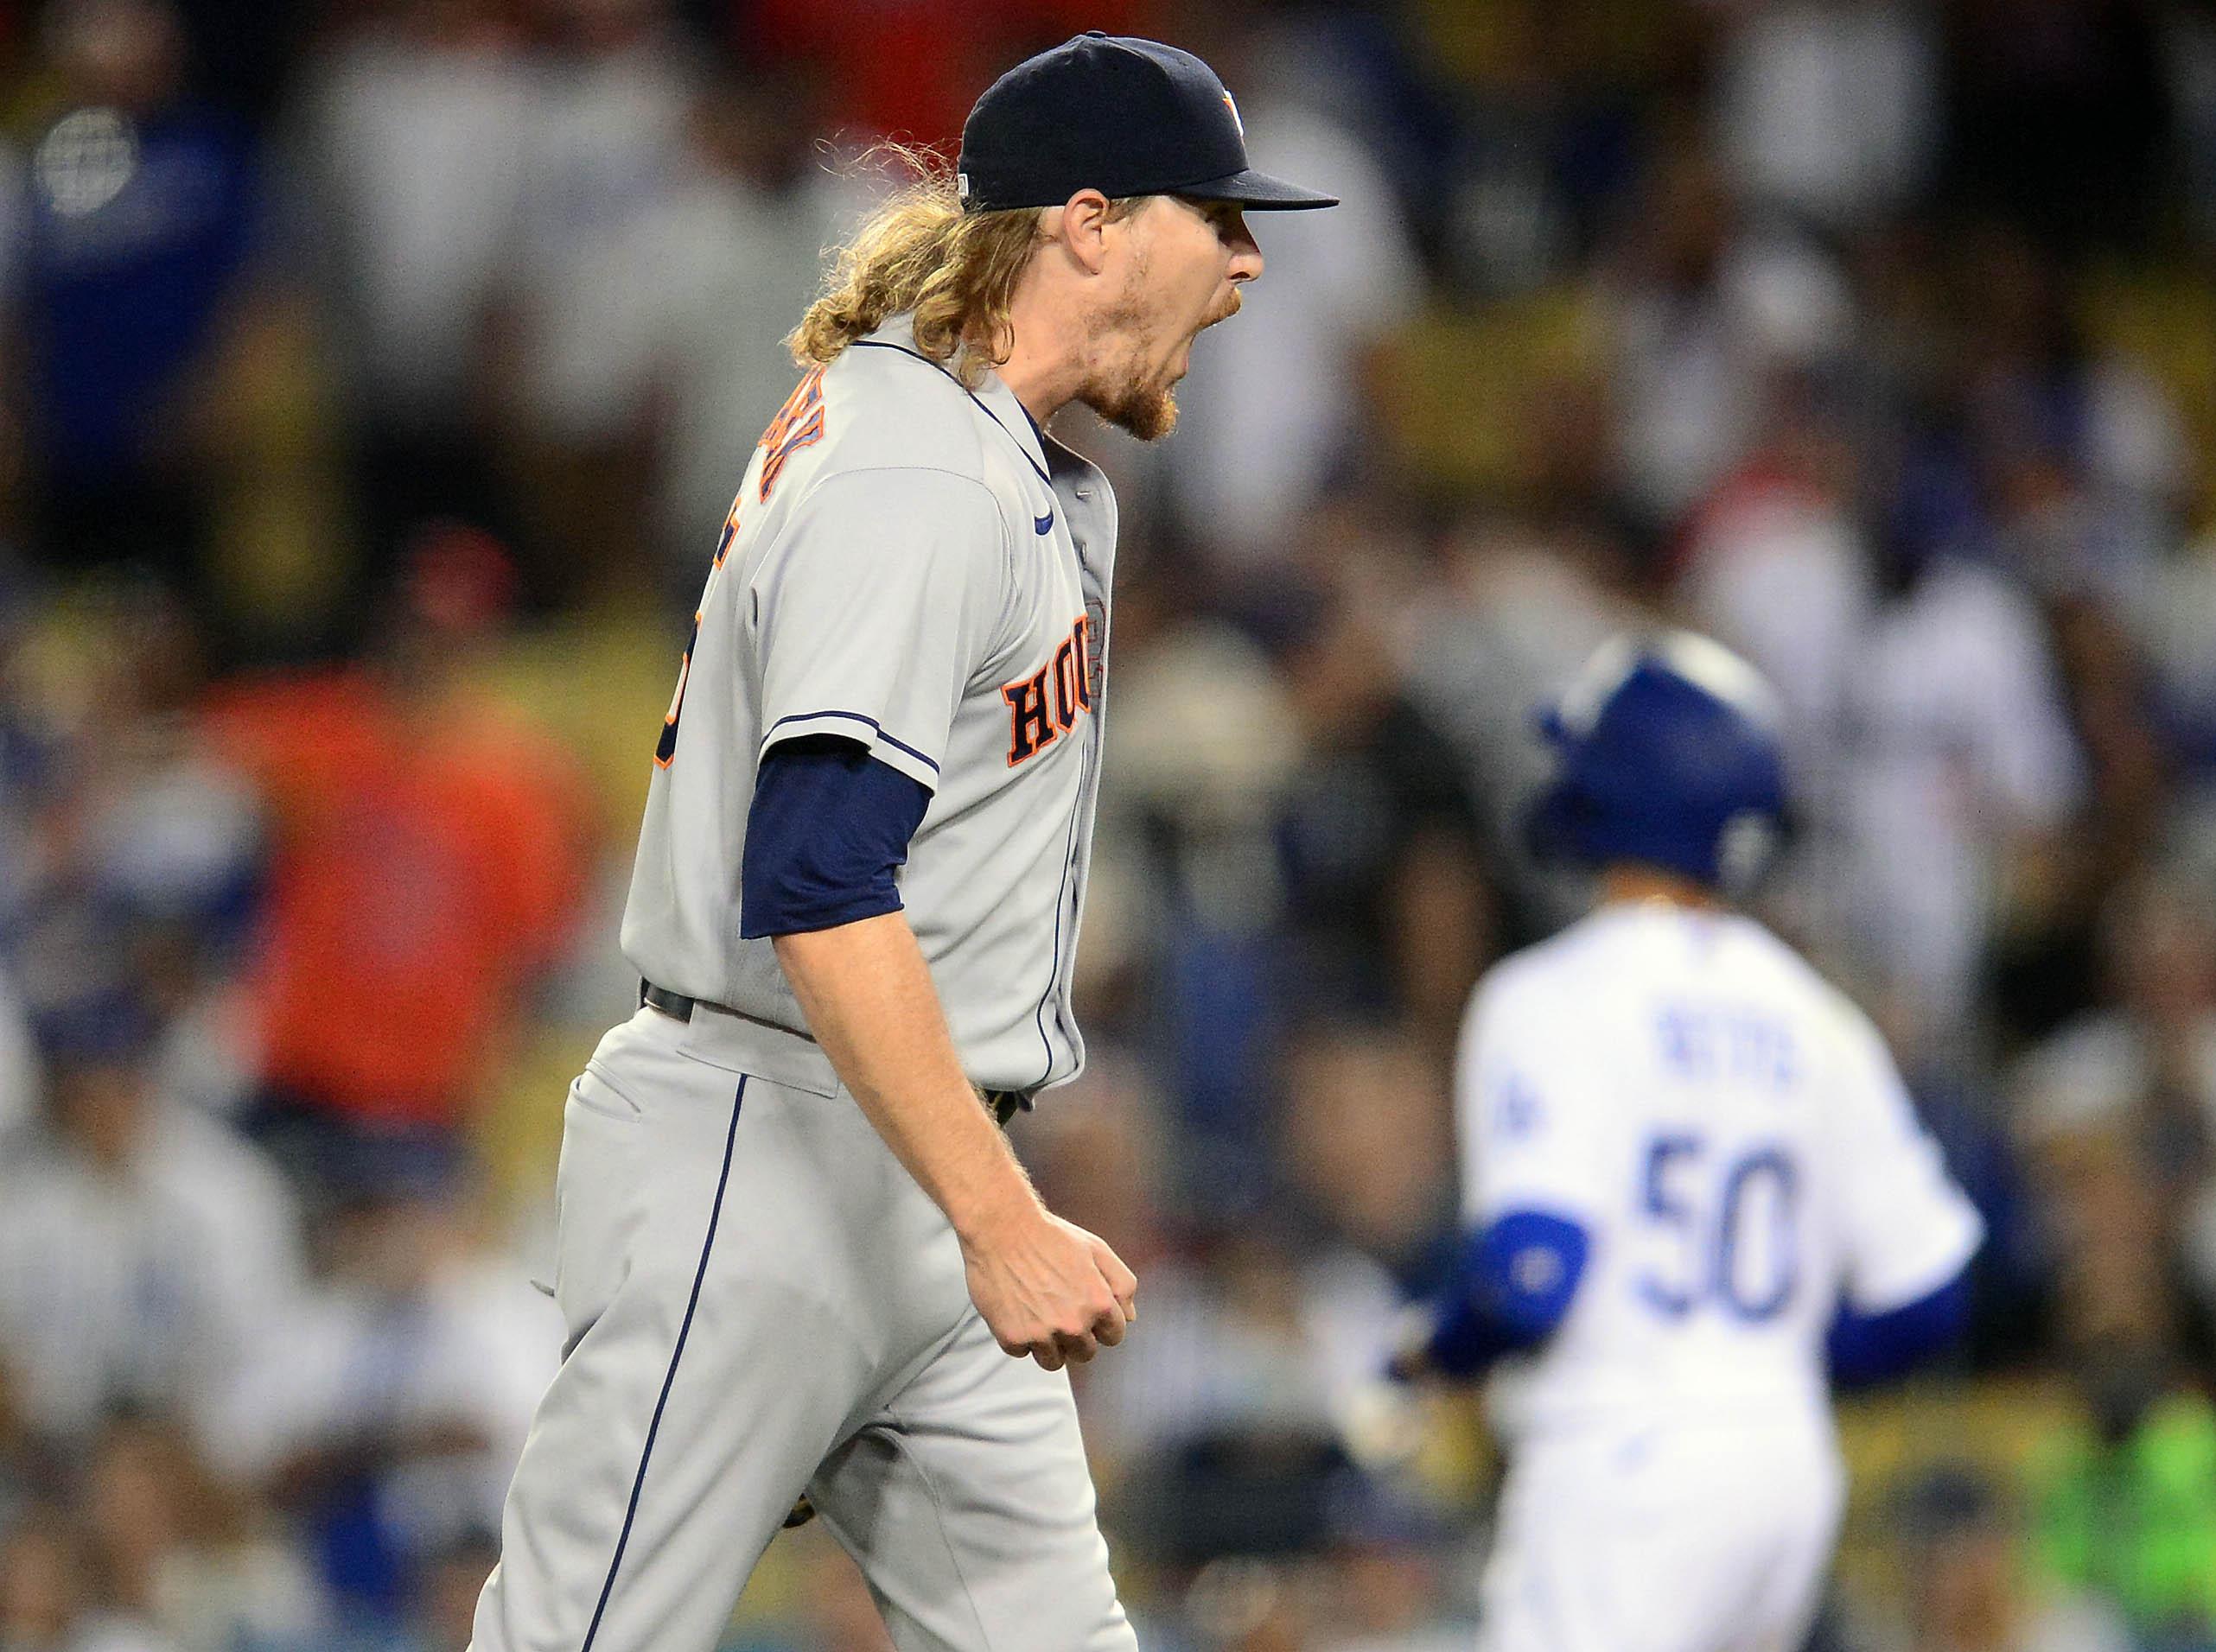 MLB: Houston Astros at Los Angeles Dodgers